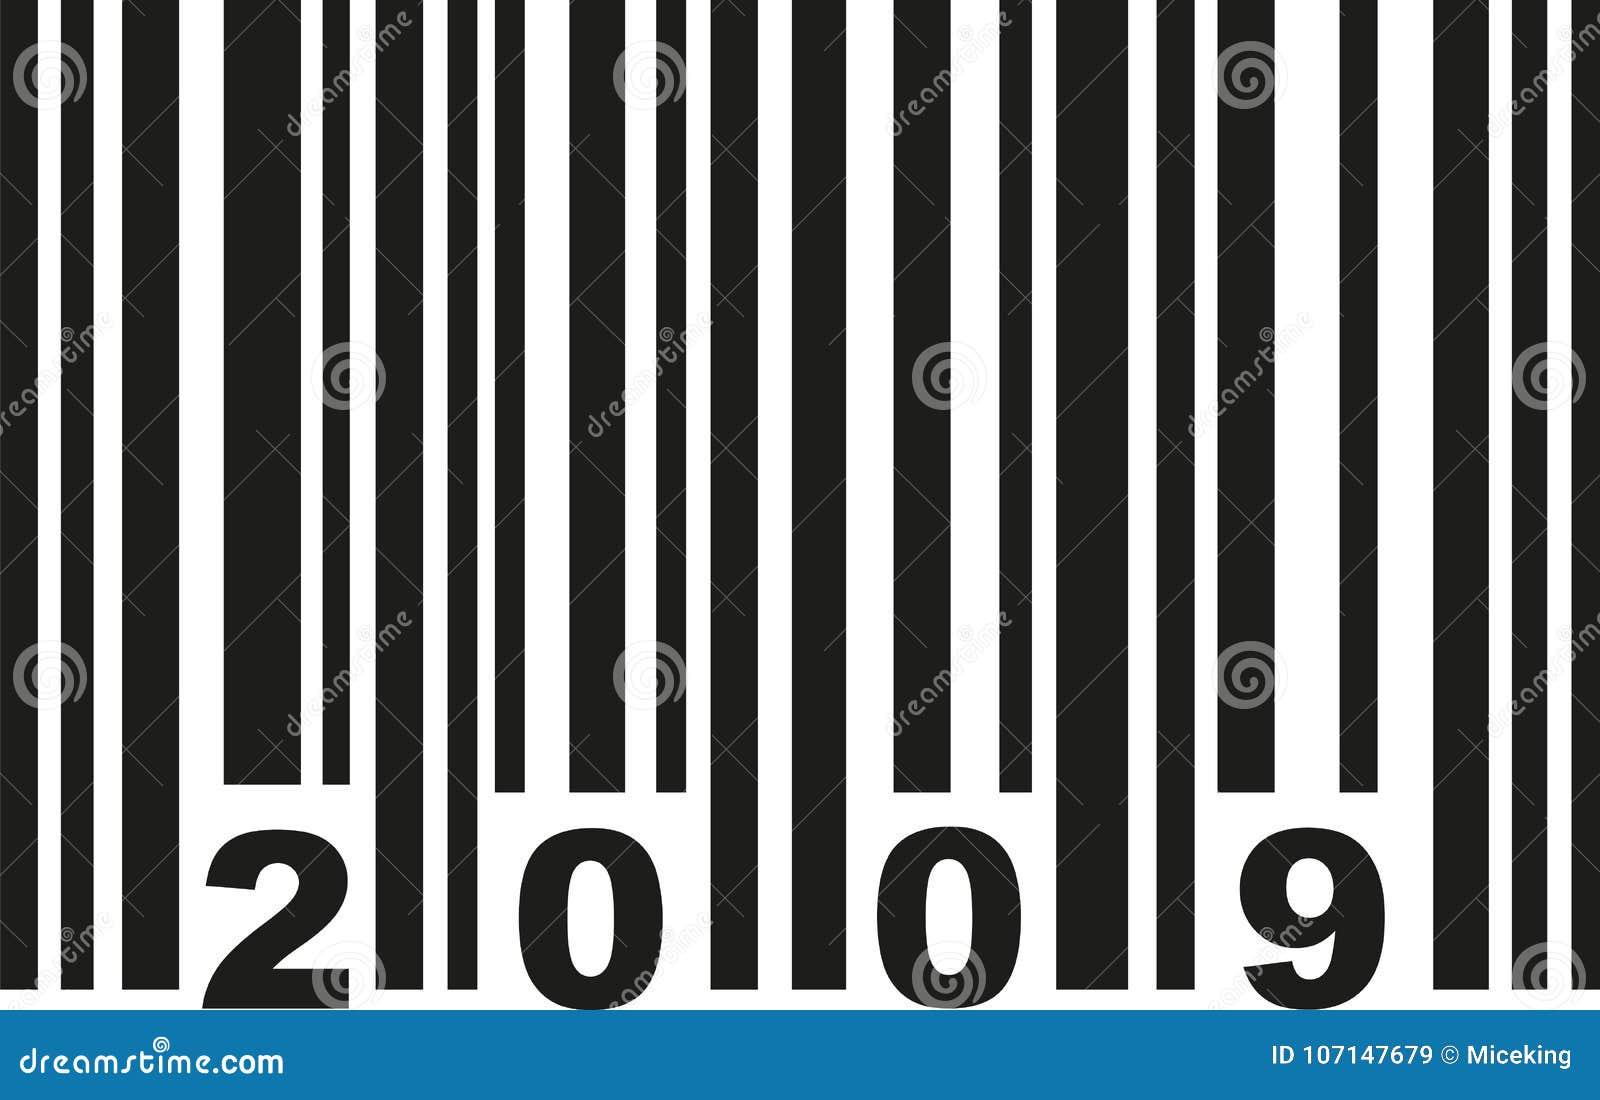 Vektor des Barcodes 2009